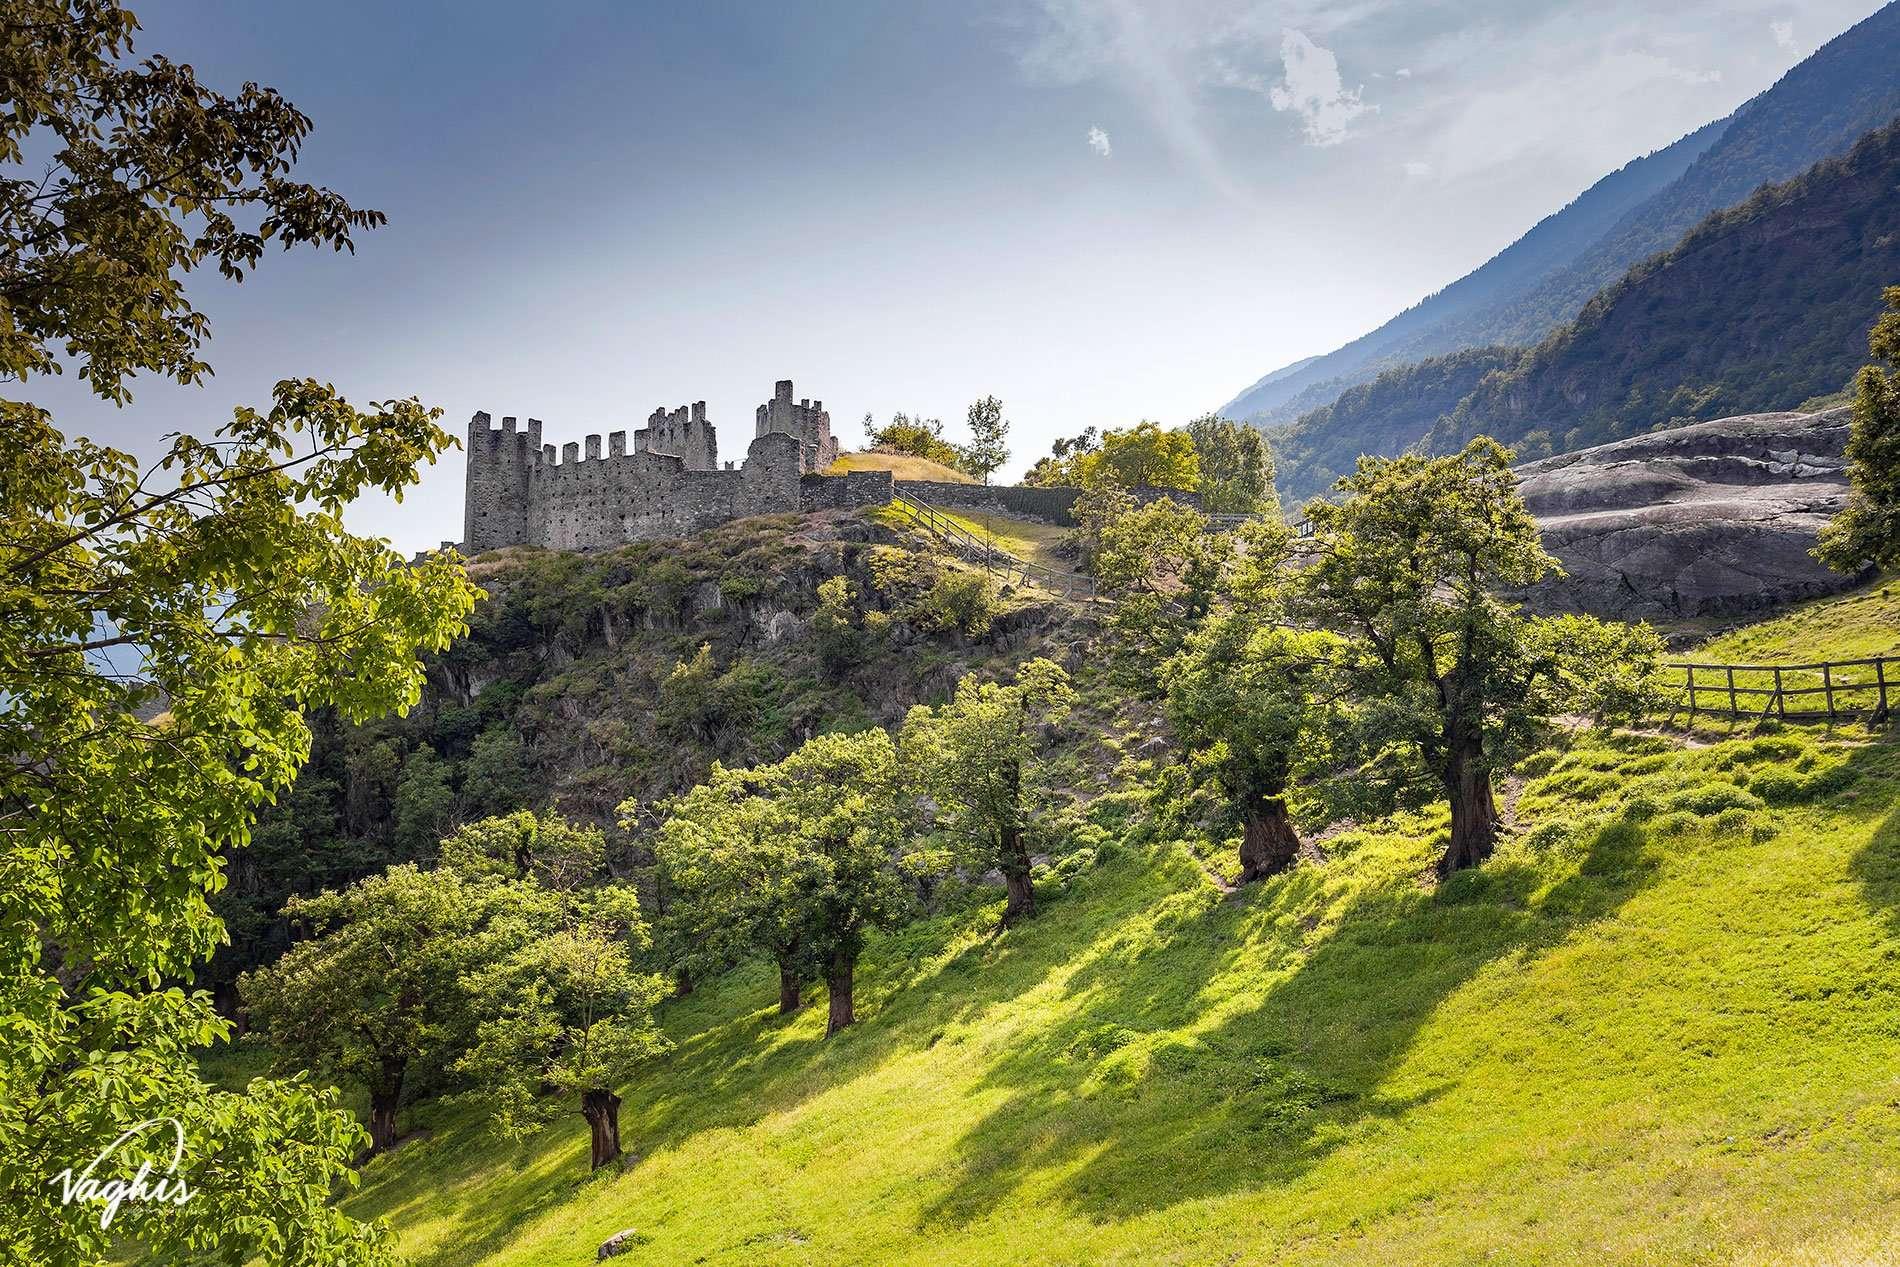 Grosio - © Vaghis - Viaggi & turismo Italia - Tutti i diritti riservati